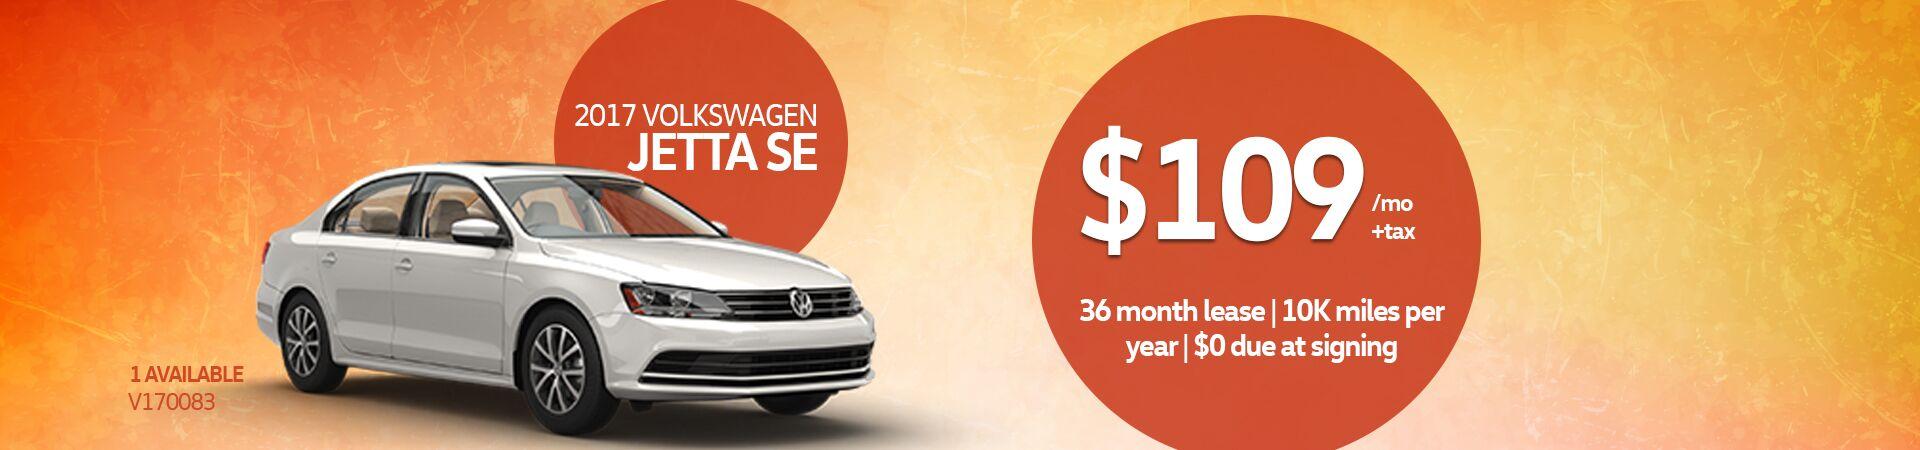 Volkswagen Dealership San Jose Ca Used Cars Stevens Creek